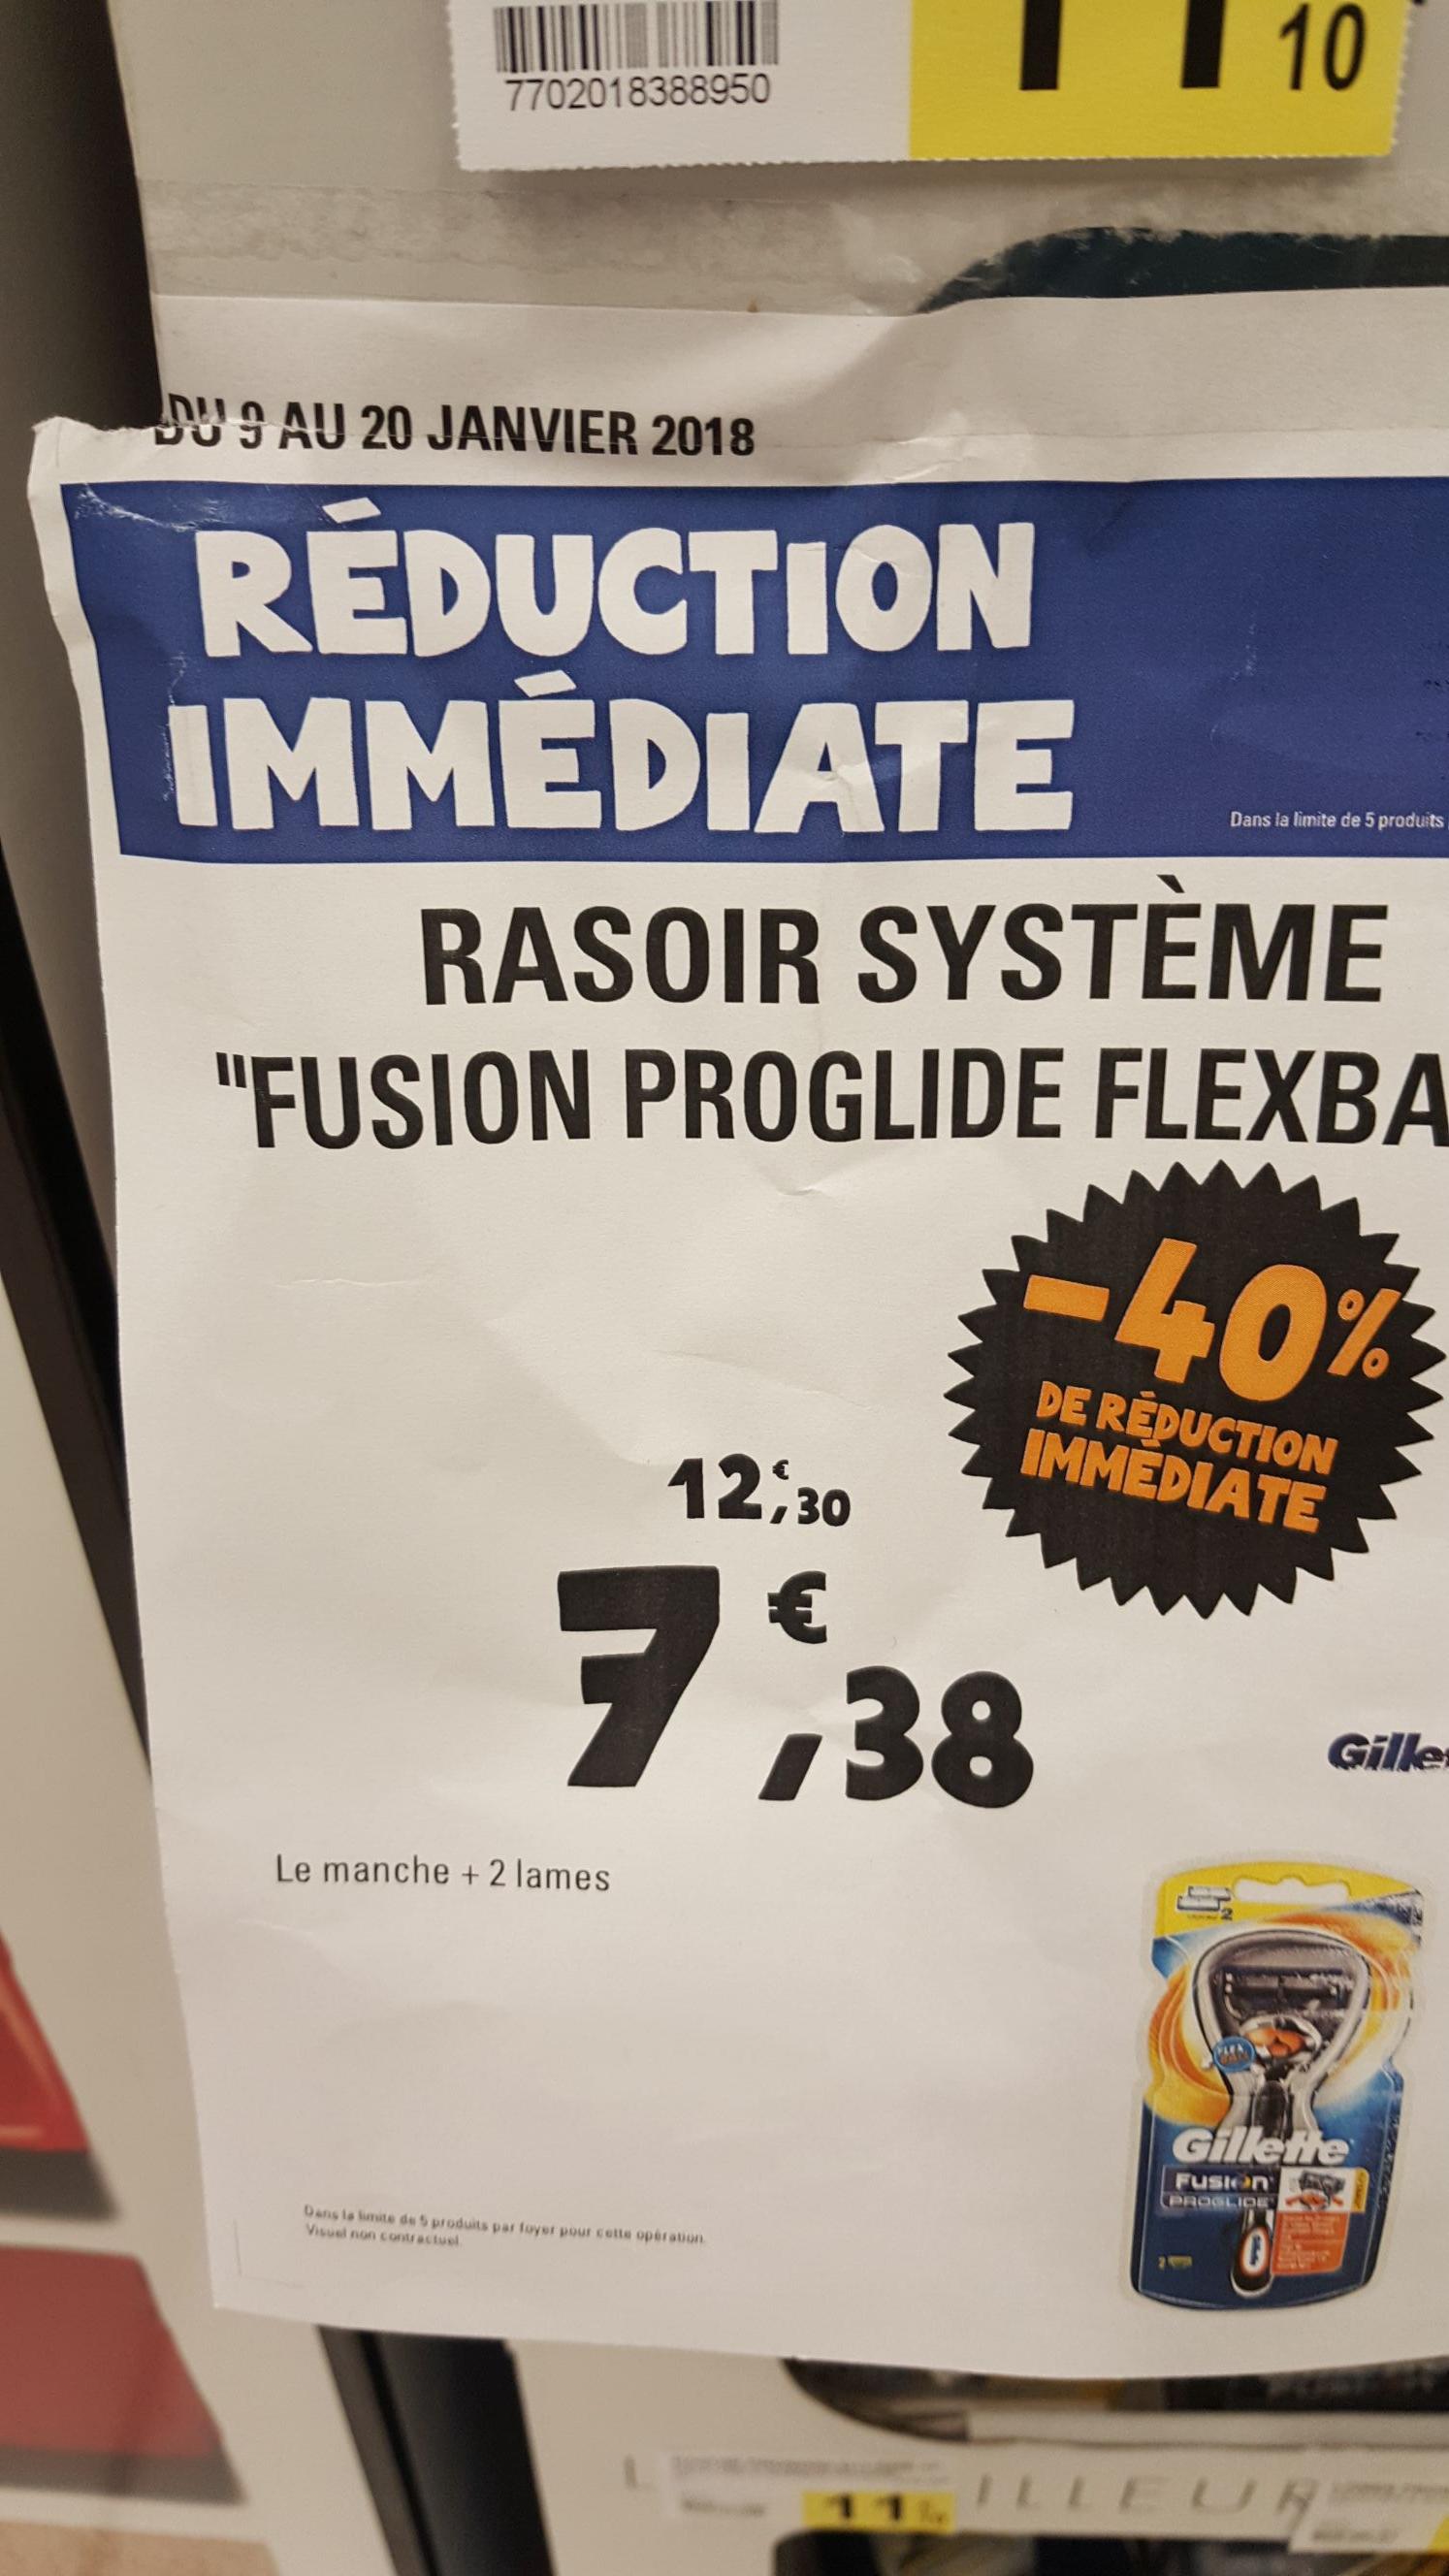 Rasoir Gilette Fusion Flexball - Bonneuil-sur-Marne (94)